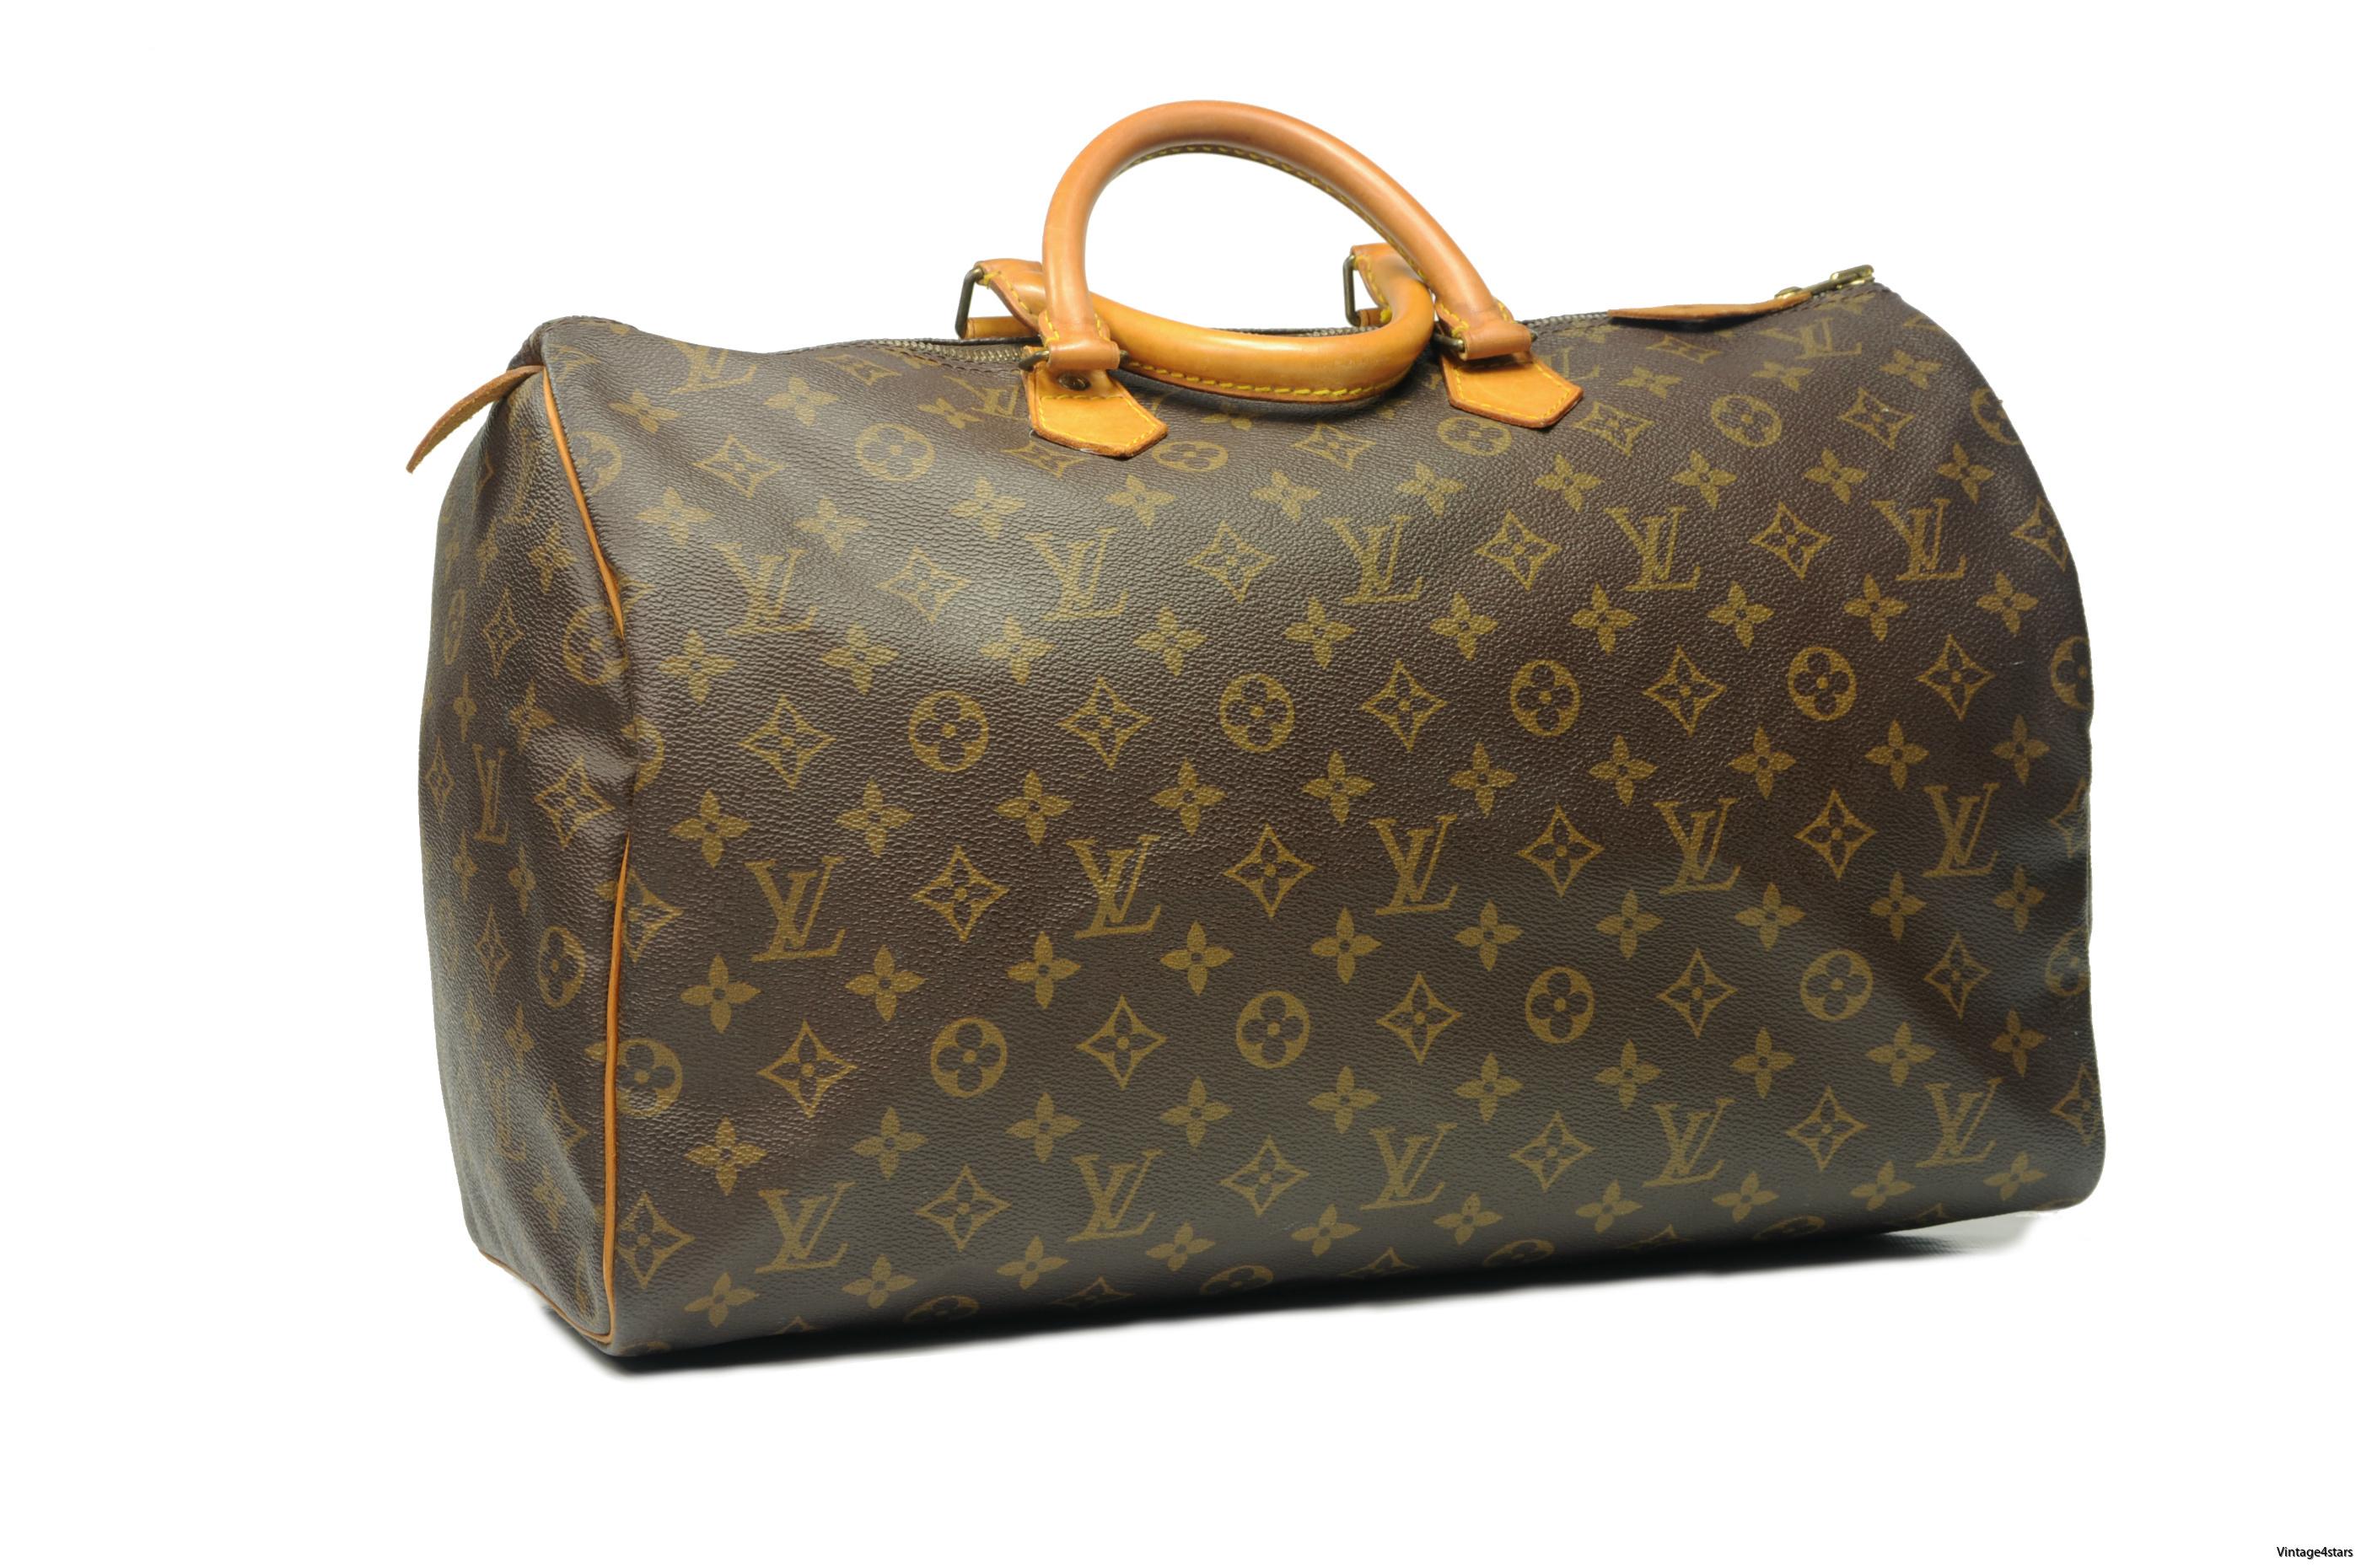 Louis Vuitton Speedy 40 Monogram 1